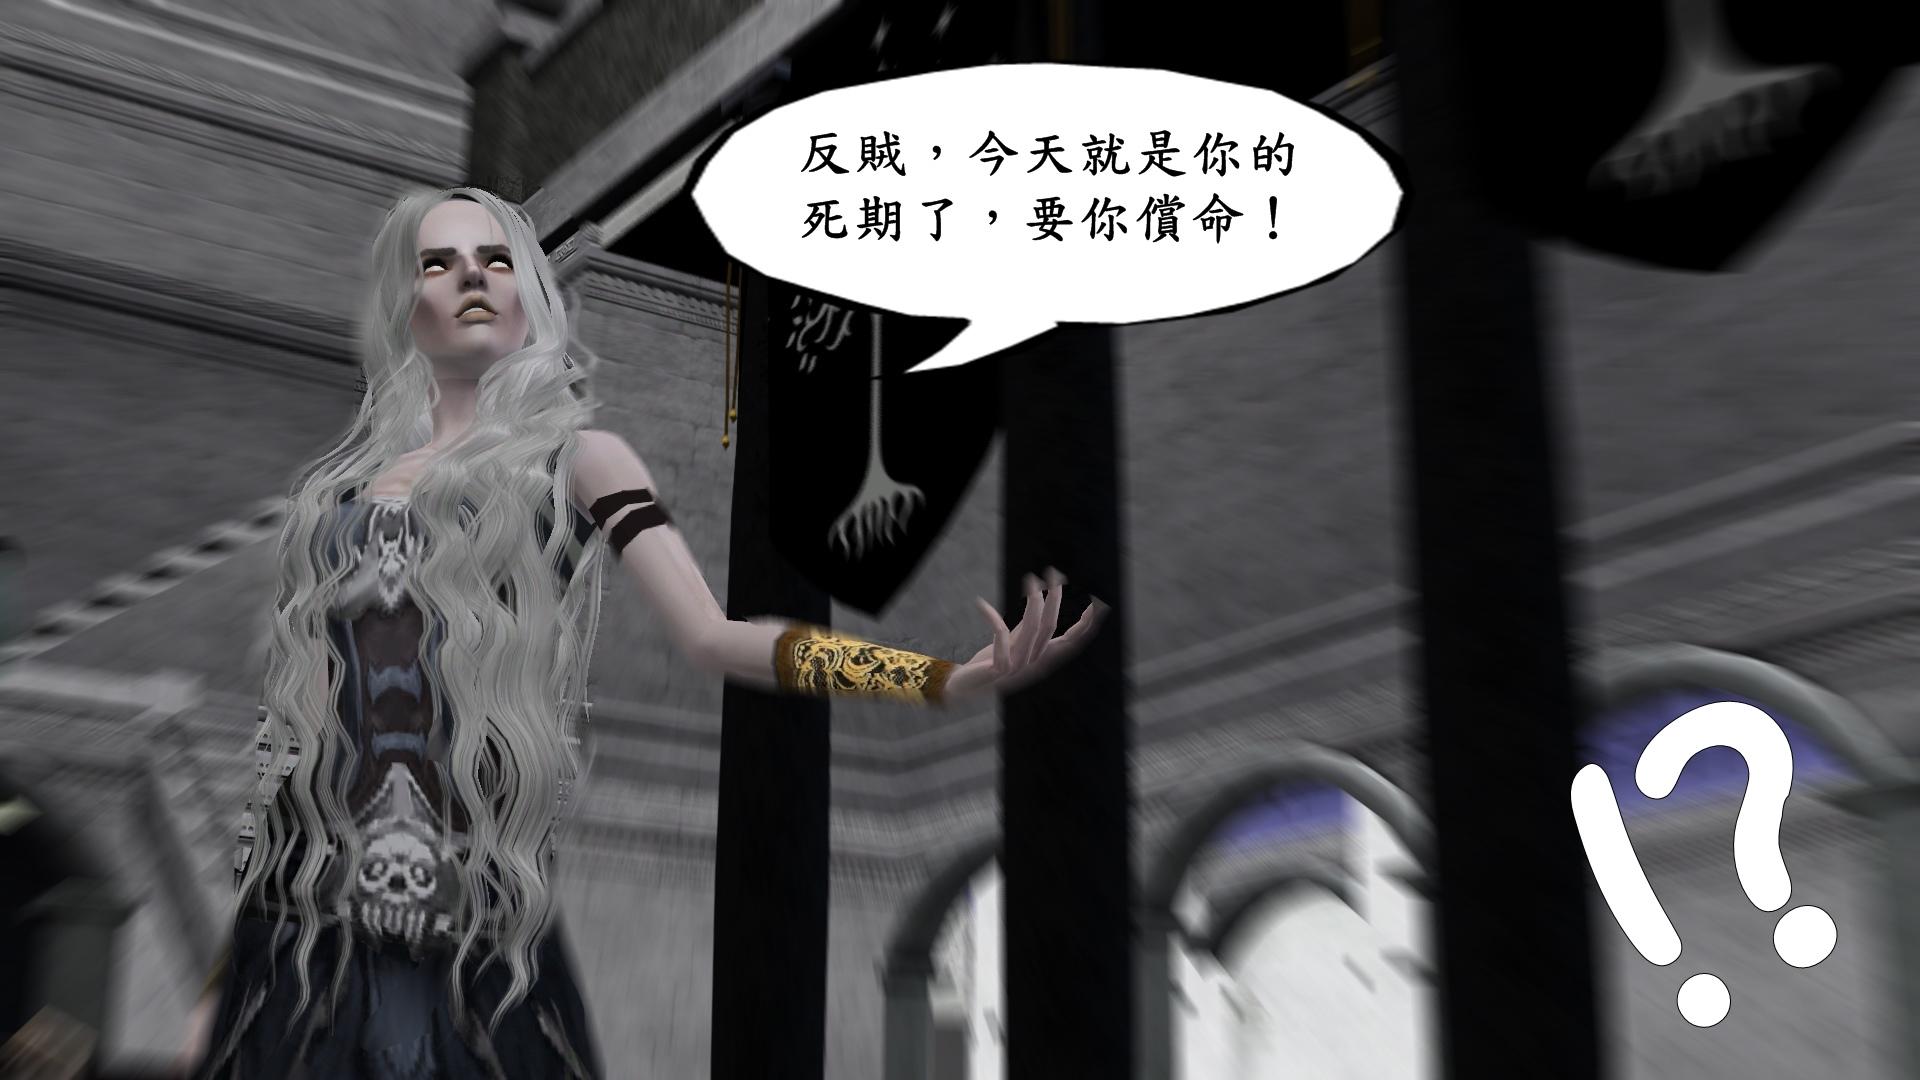 D04反賊,今天就是你的死期了,要你償命! (2).jpg